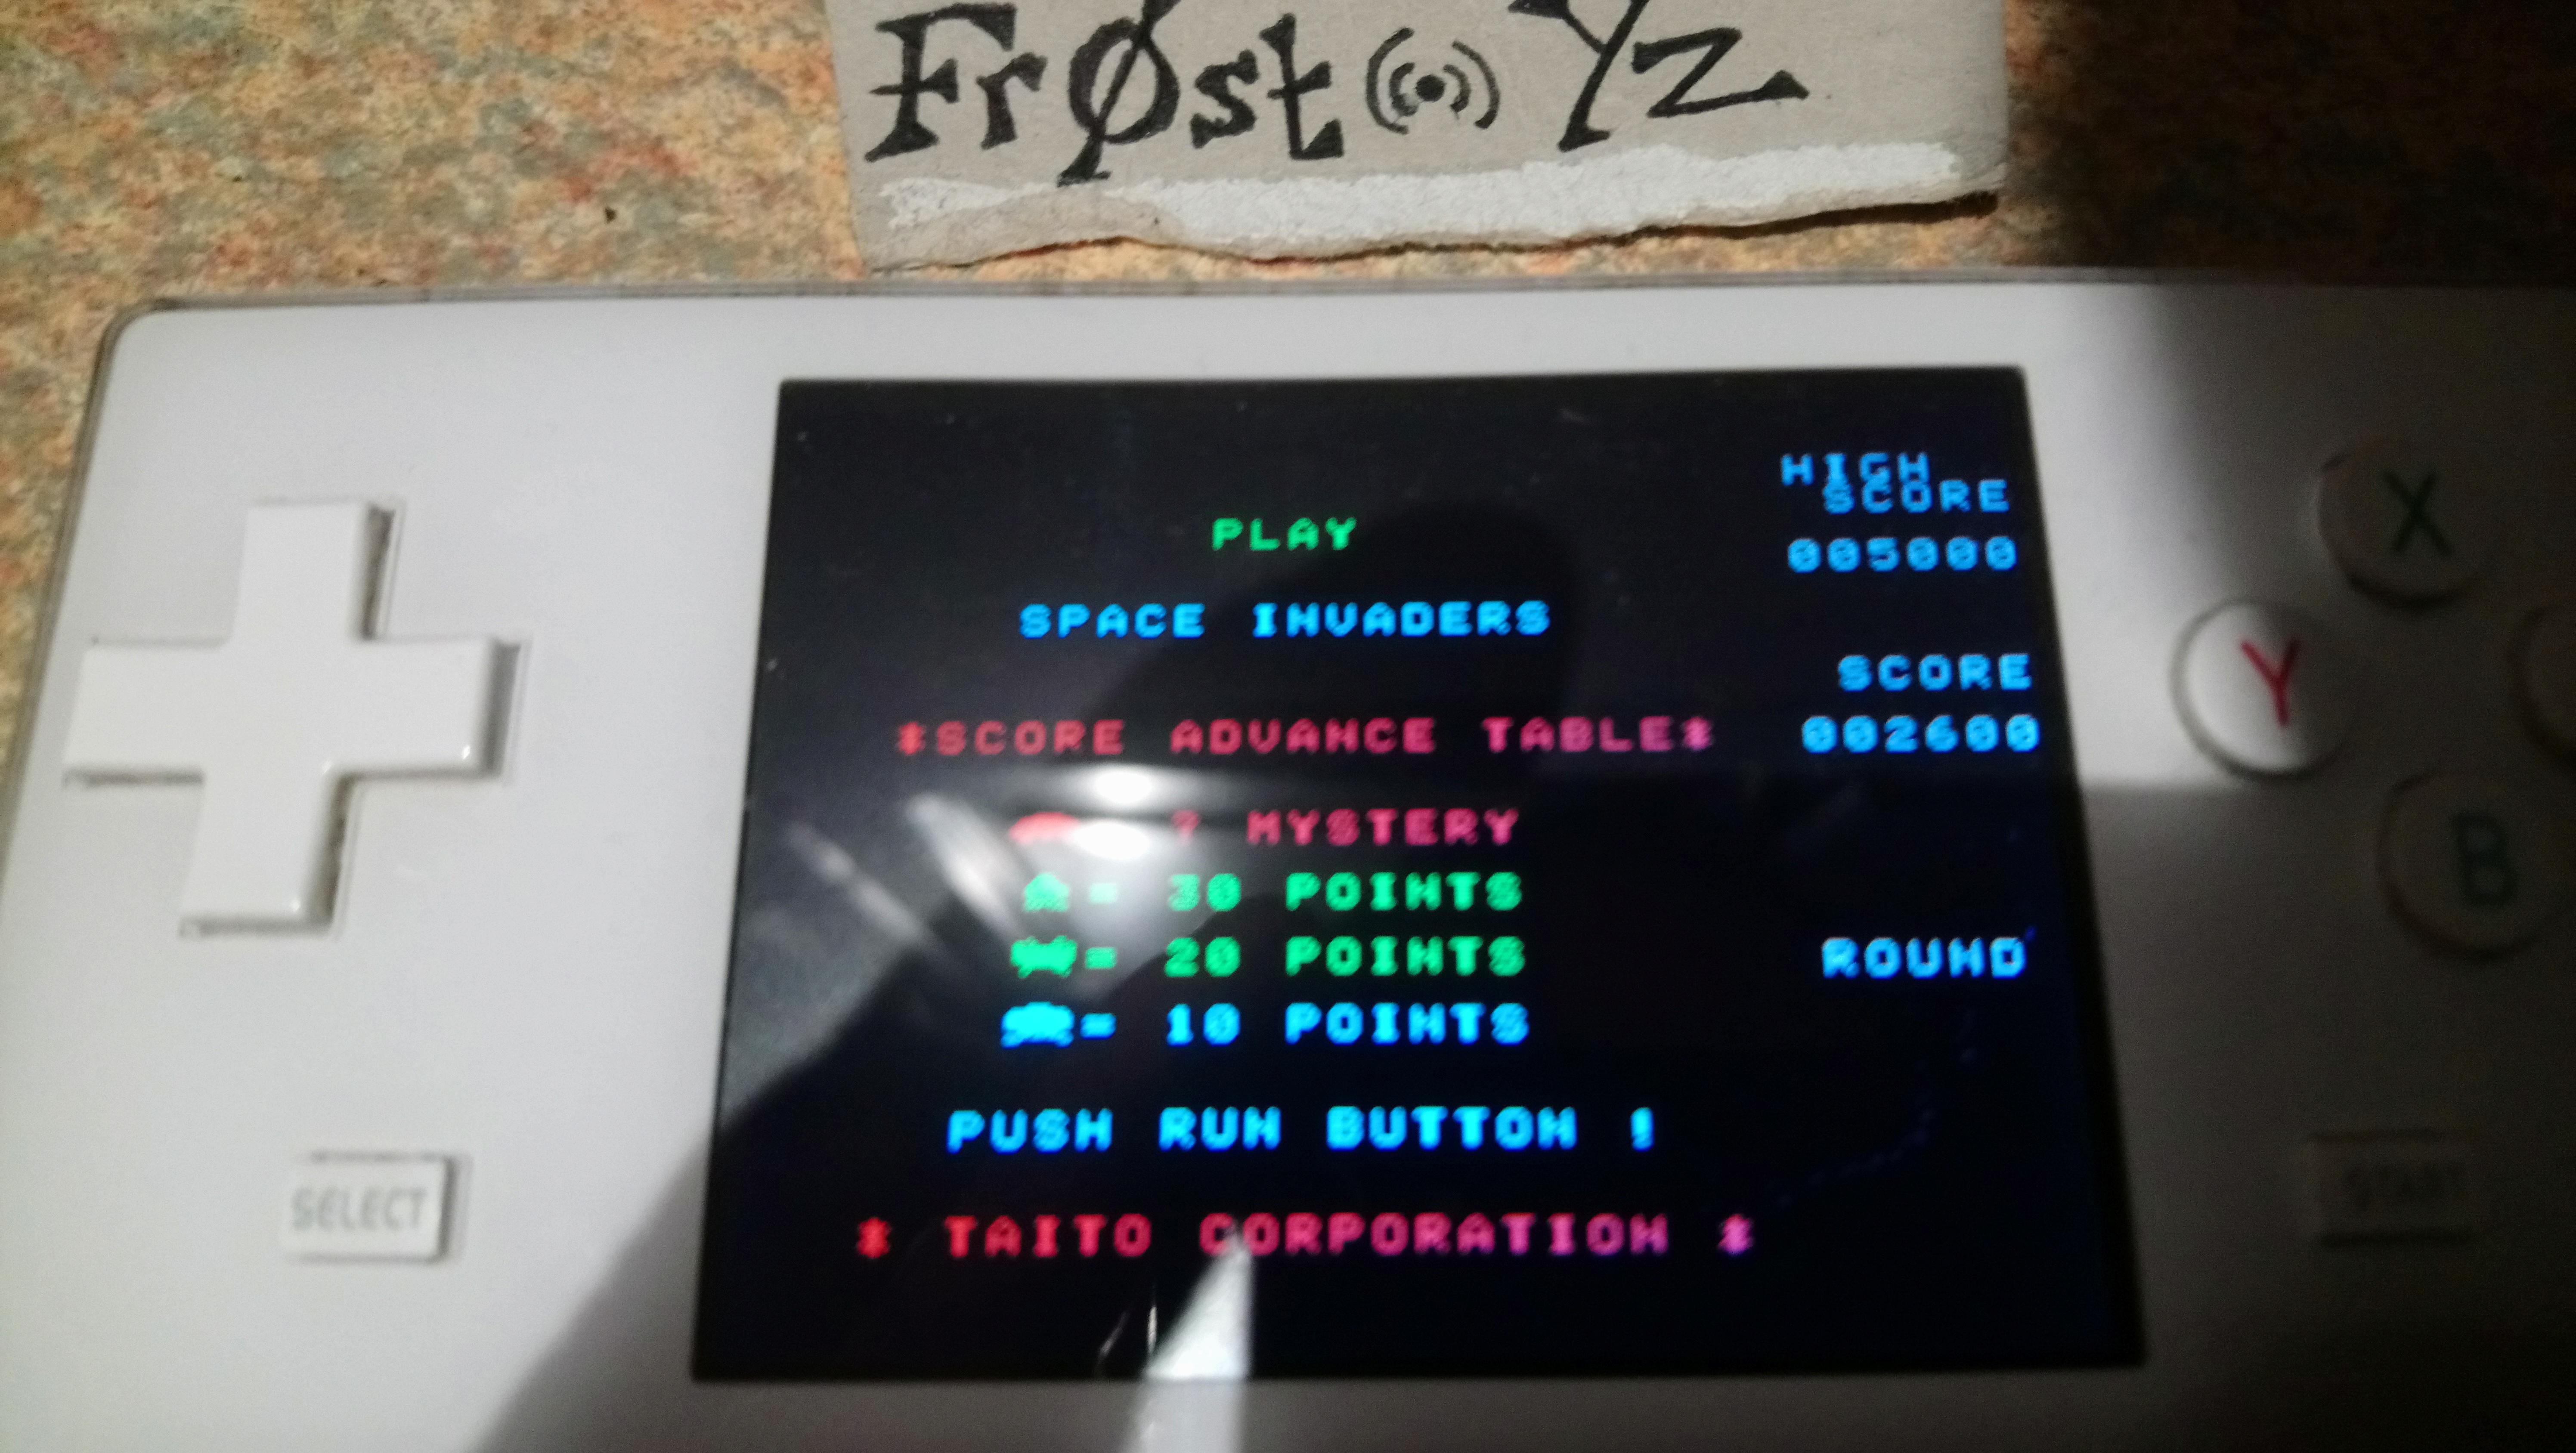 Fr0st: Space Invaders: Fukkatsu no Hi [Classic Mode] (TurboGrafx-16/PC Engine Emulated) 2,600 points on 2019-02-04 15:39:07